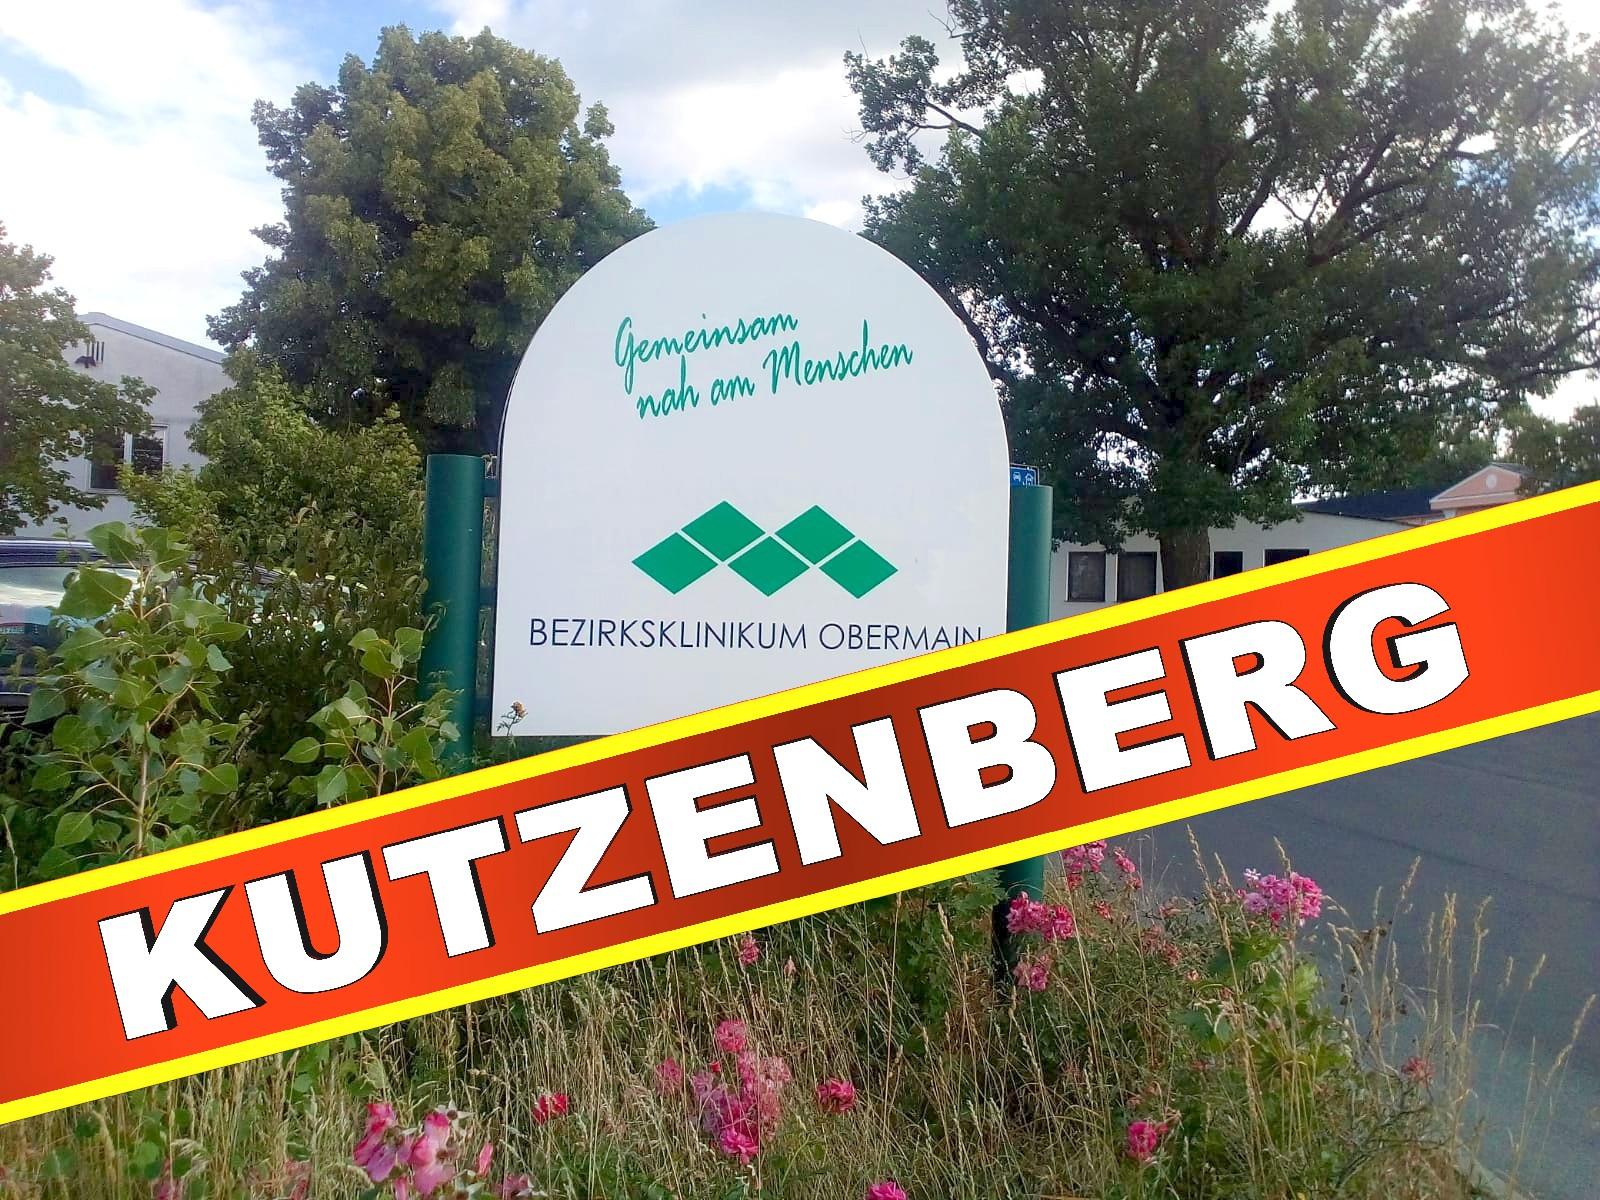 Bezirksklinikum Obermain Kutzenberg, 96250 Ebensfeld Psychiatrie Polizei Krankenhaus (38)